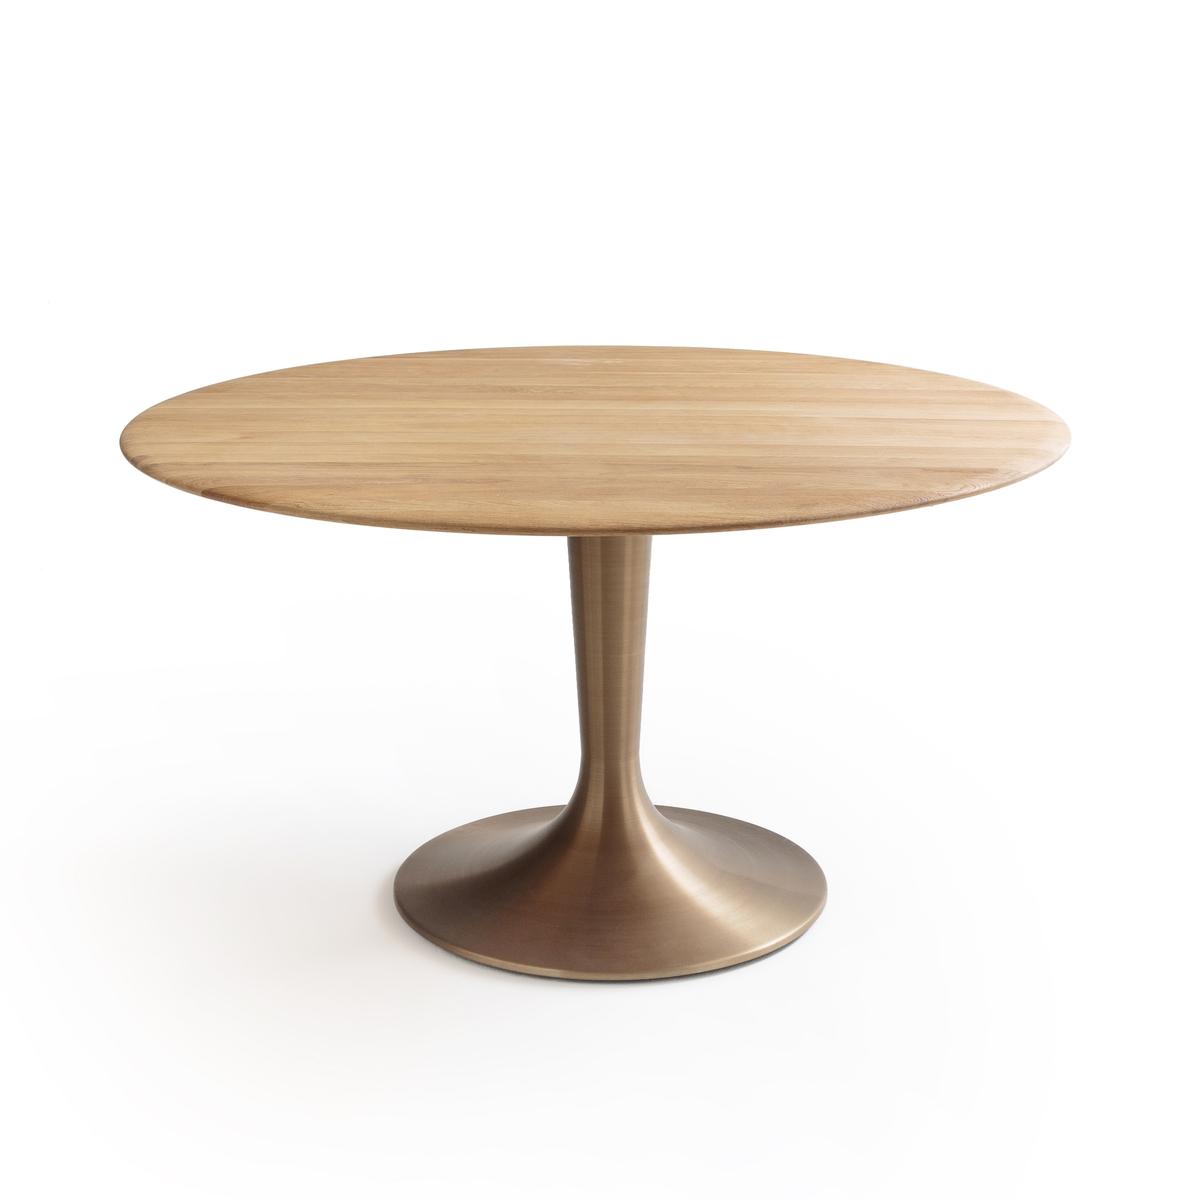 Столешница для стола Ø130 см Hisia из массива дуба